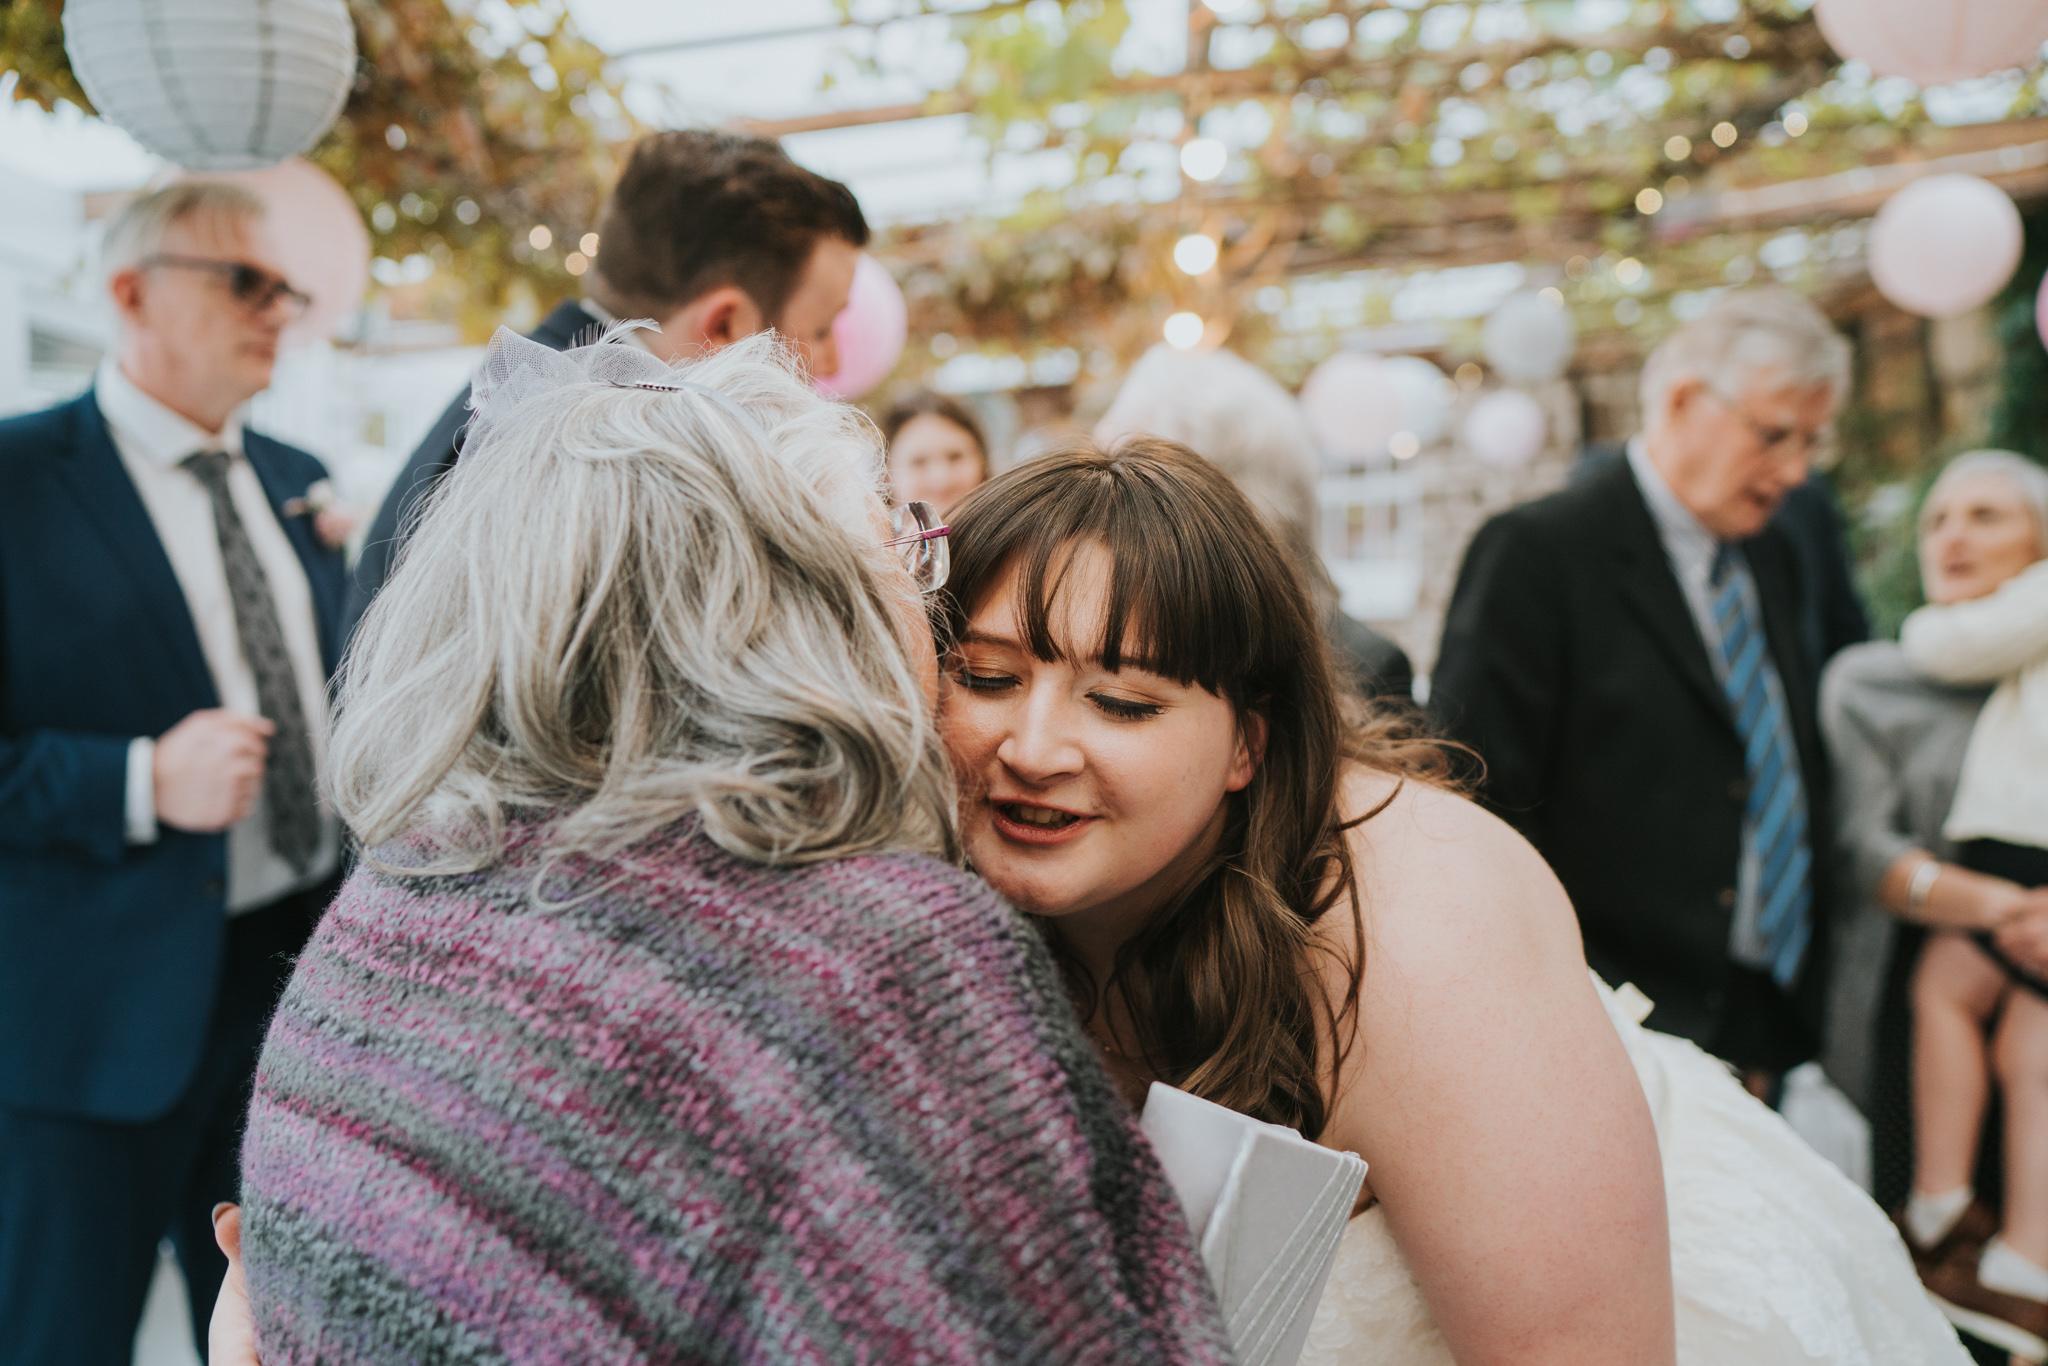 grace-sam-old-barn-clovelly-devon-wedding-photographer-grace-elizabeth-essex-suffolk-norfolk-wedding-photographer (96 of 132).jpg